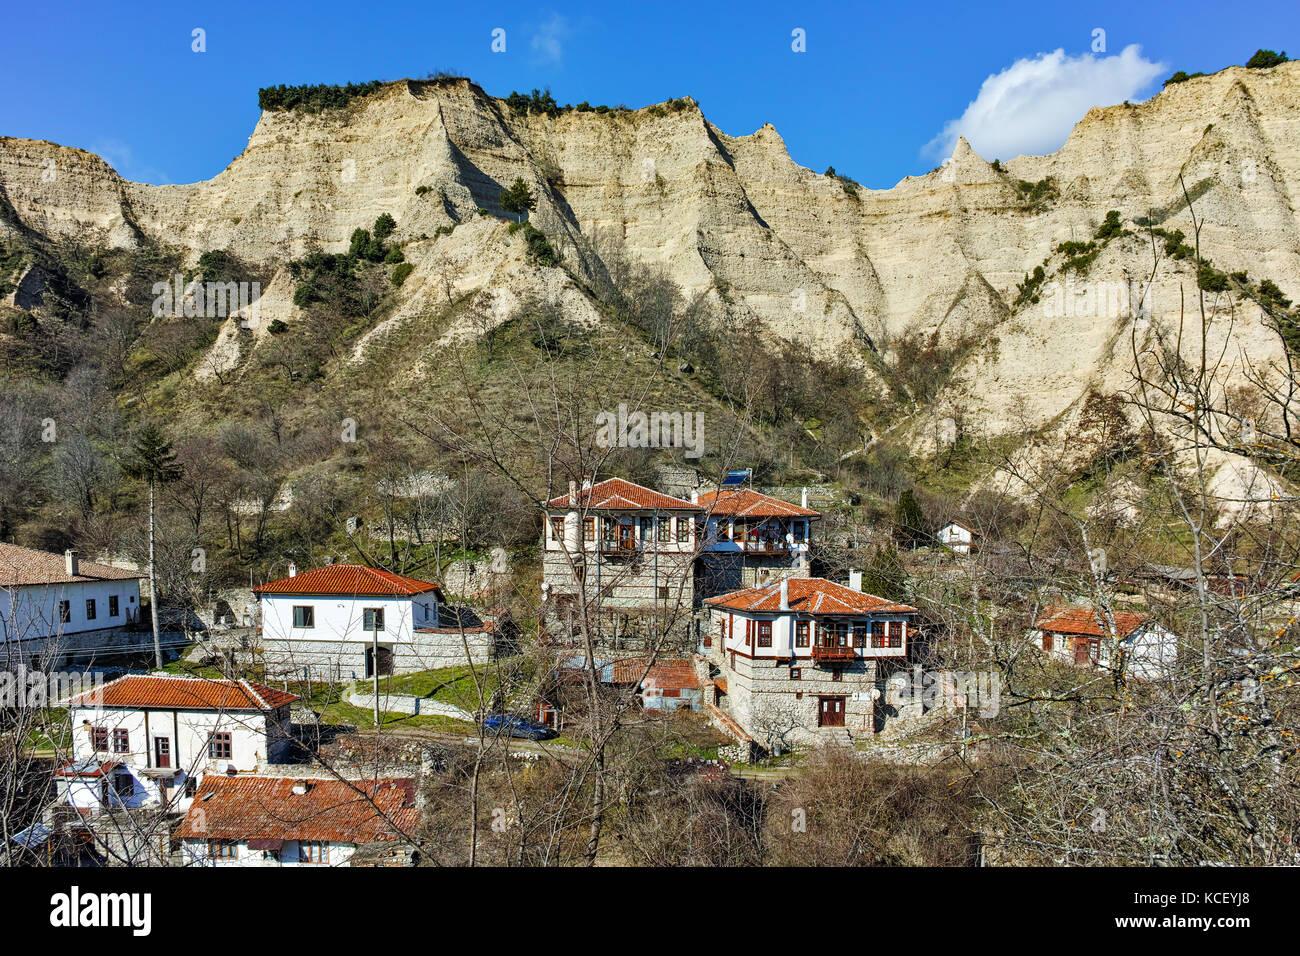 Panorama to ancient Melnik town and sand pyramids, Blagoevgrad region, Bulgaria - Stock Image